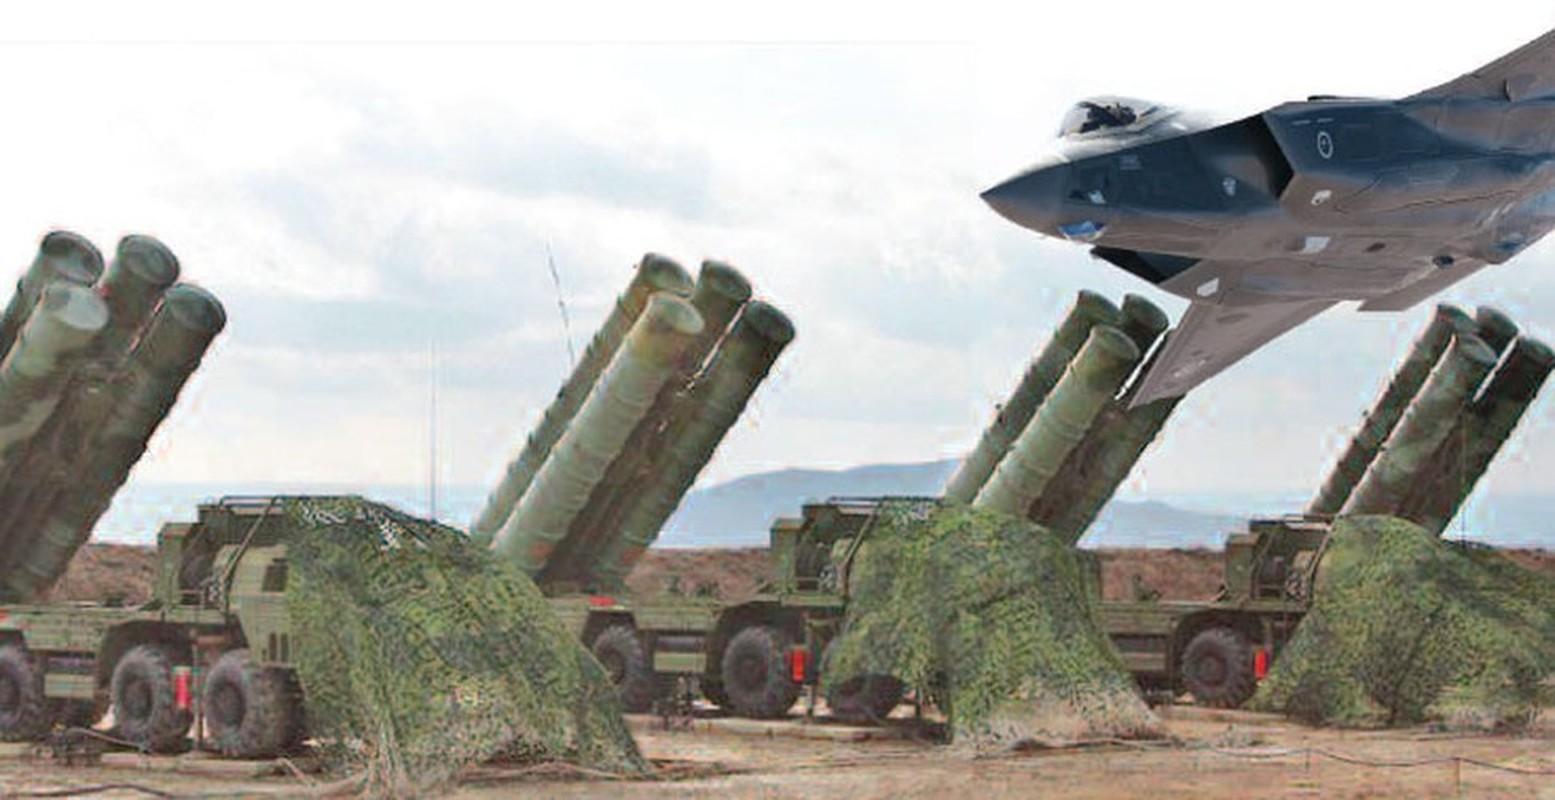 S-500 Nga se huy diet toan bo nen cong nghiep quoc phong My?-Hinh-12